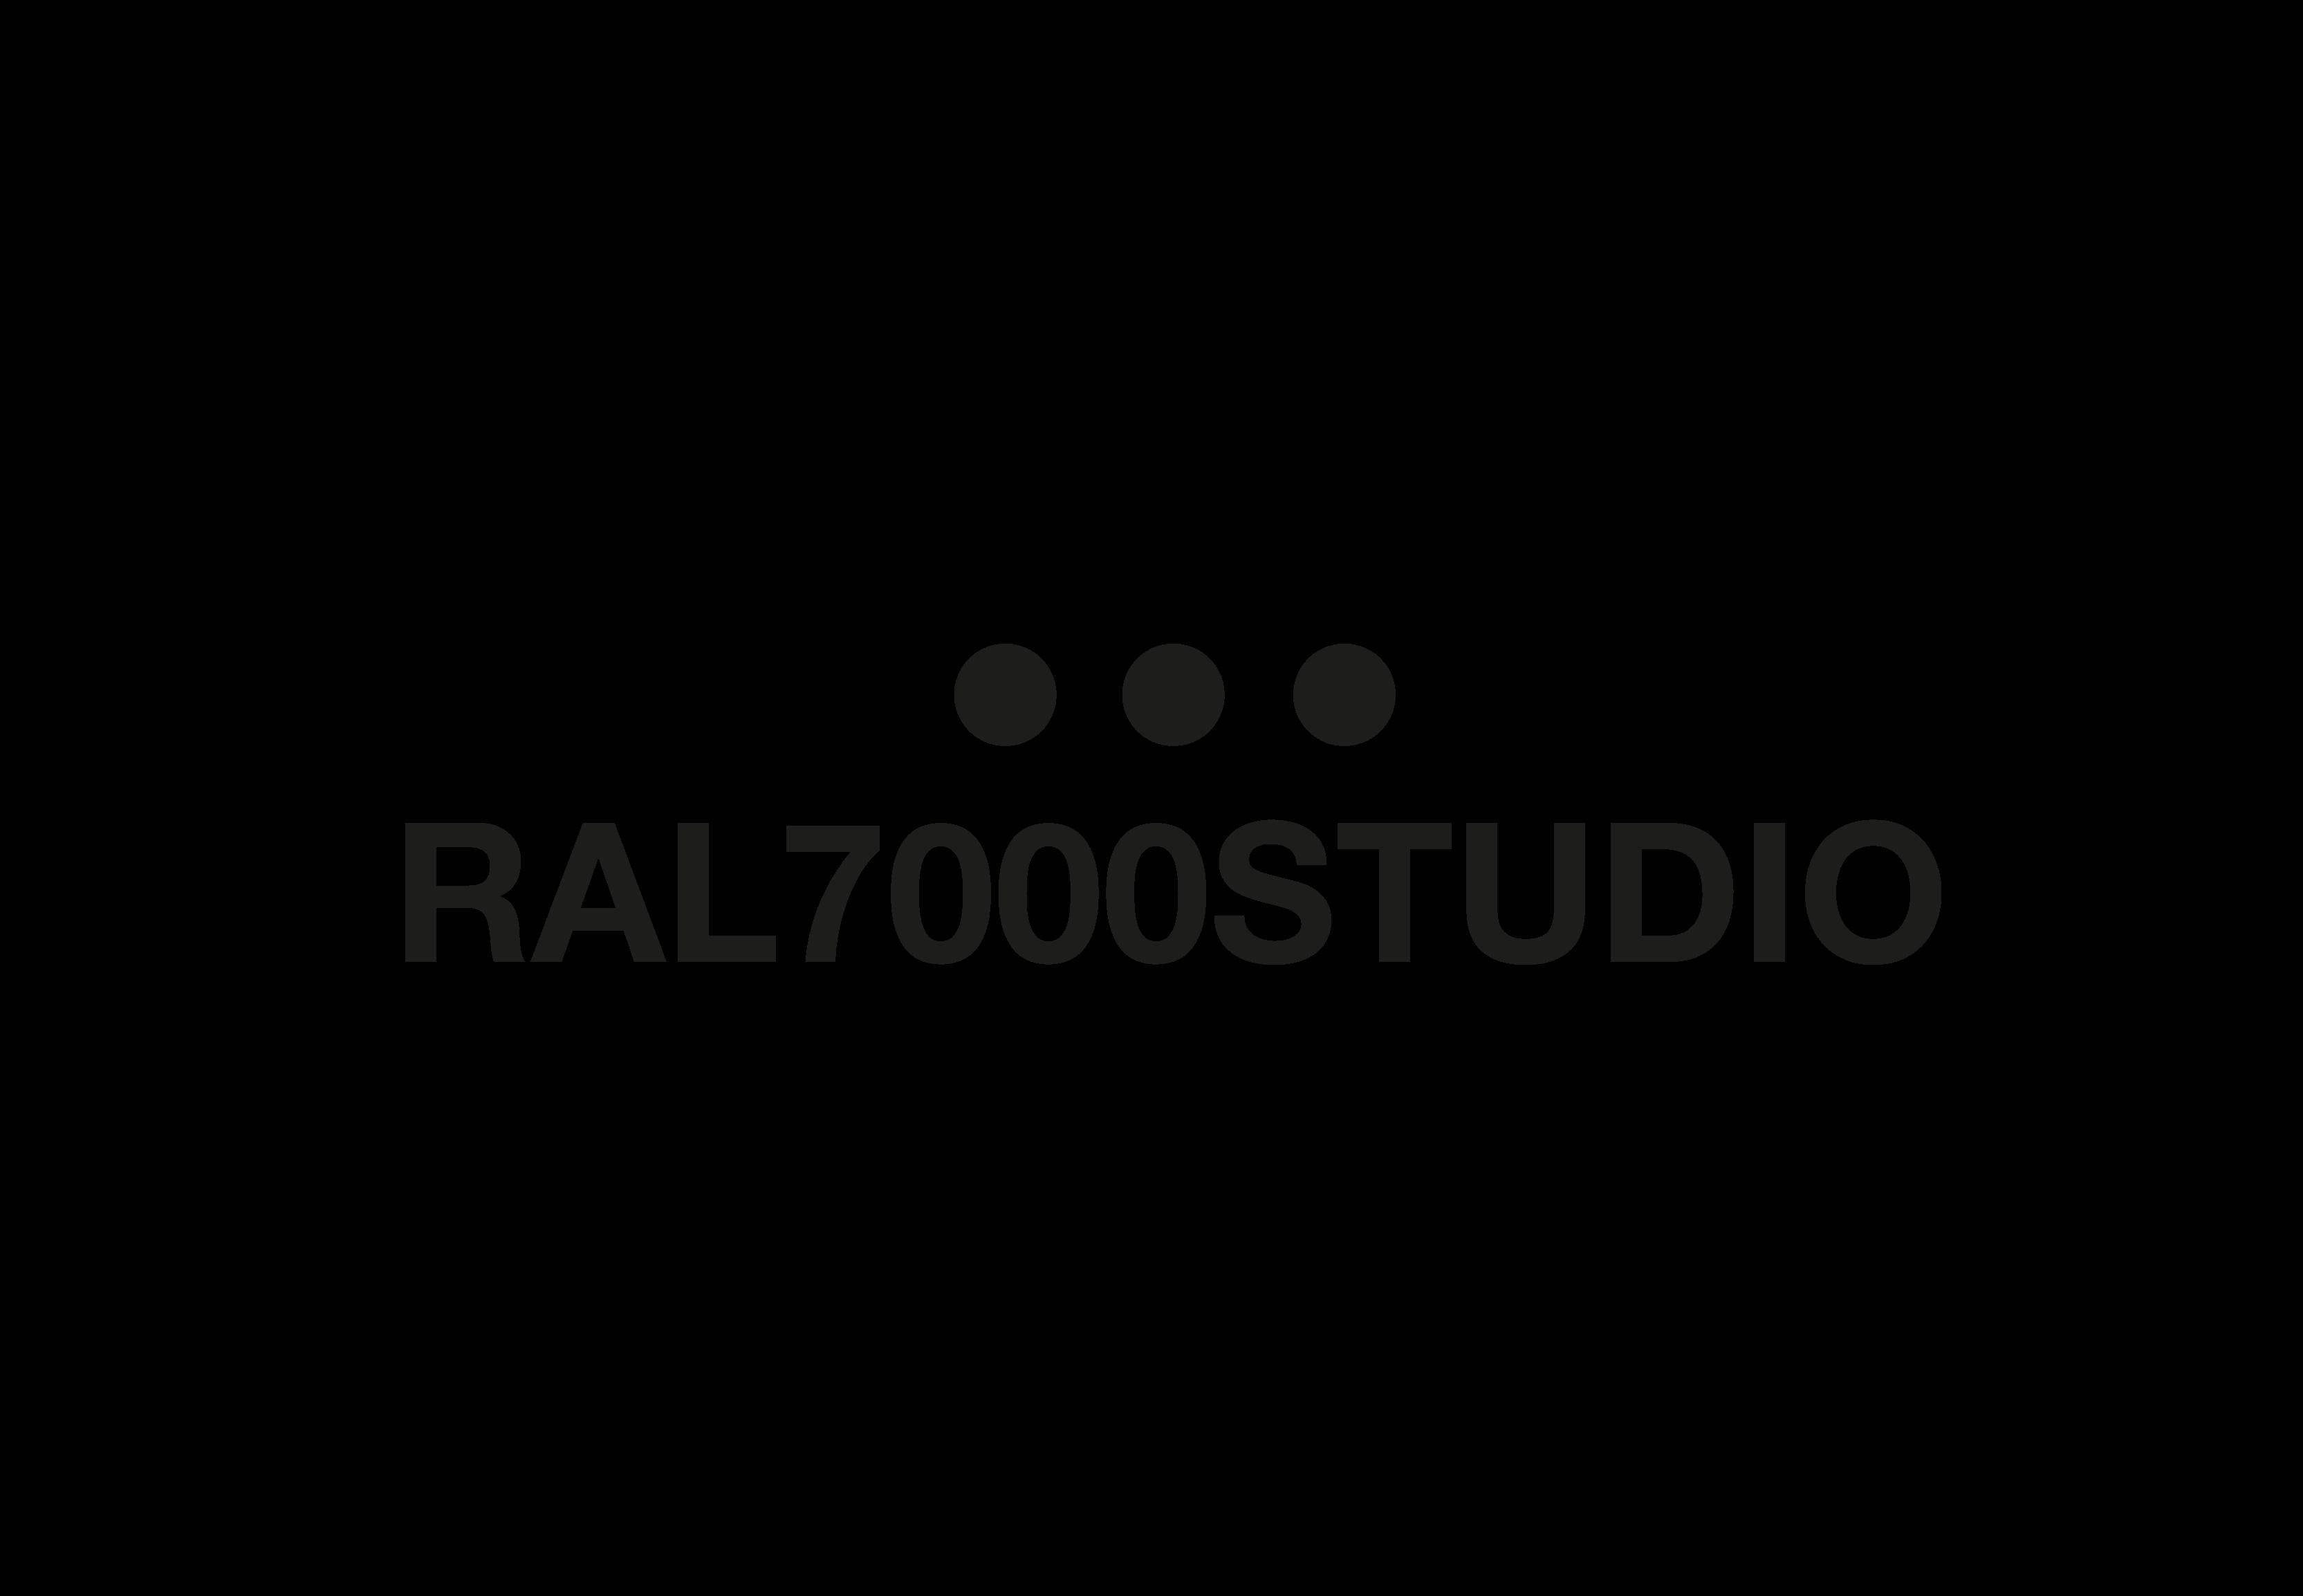 RAL7000STUDIO_logo